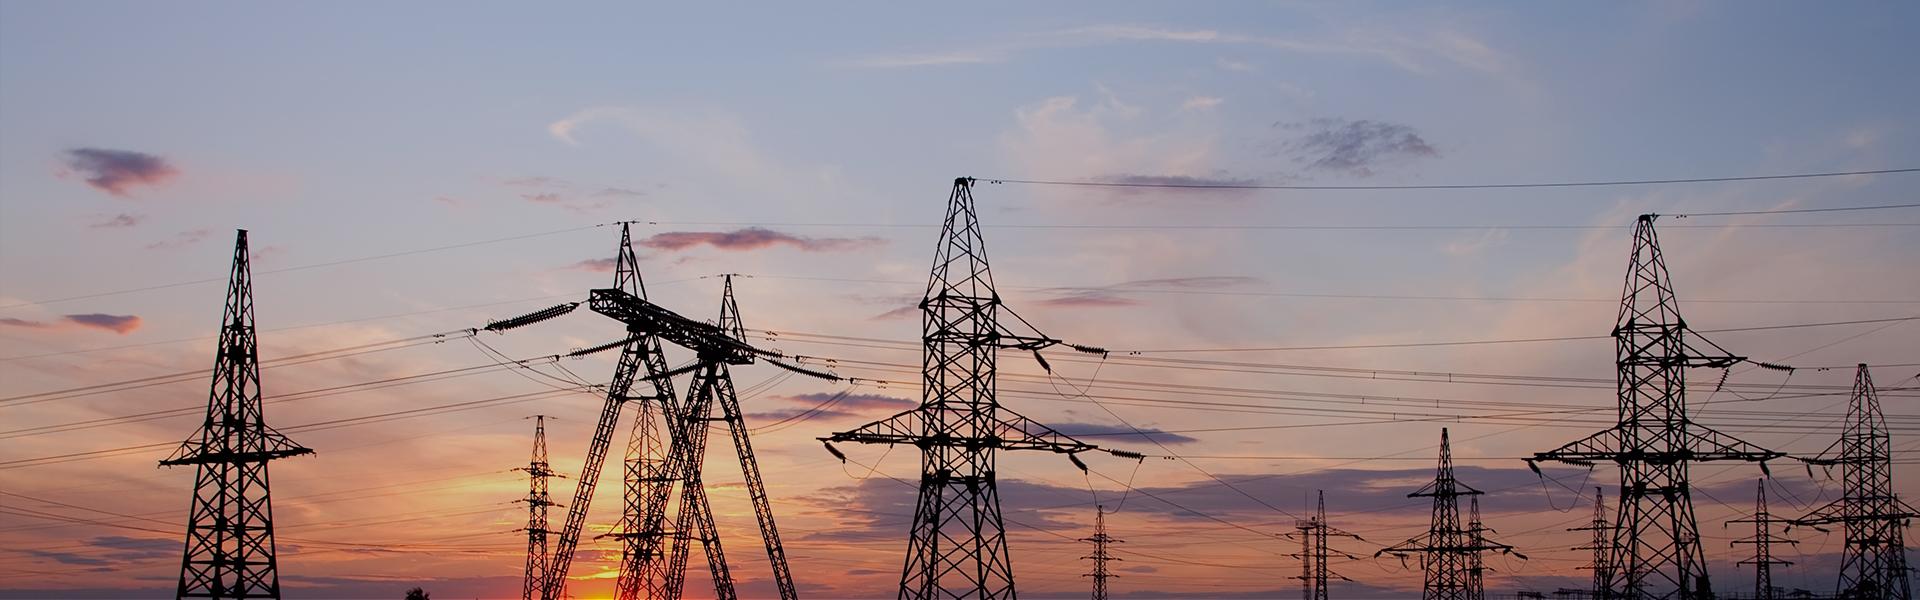 mobile energy communication